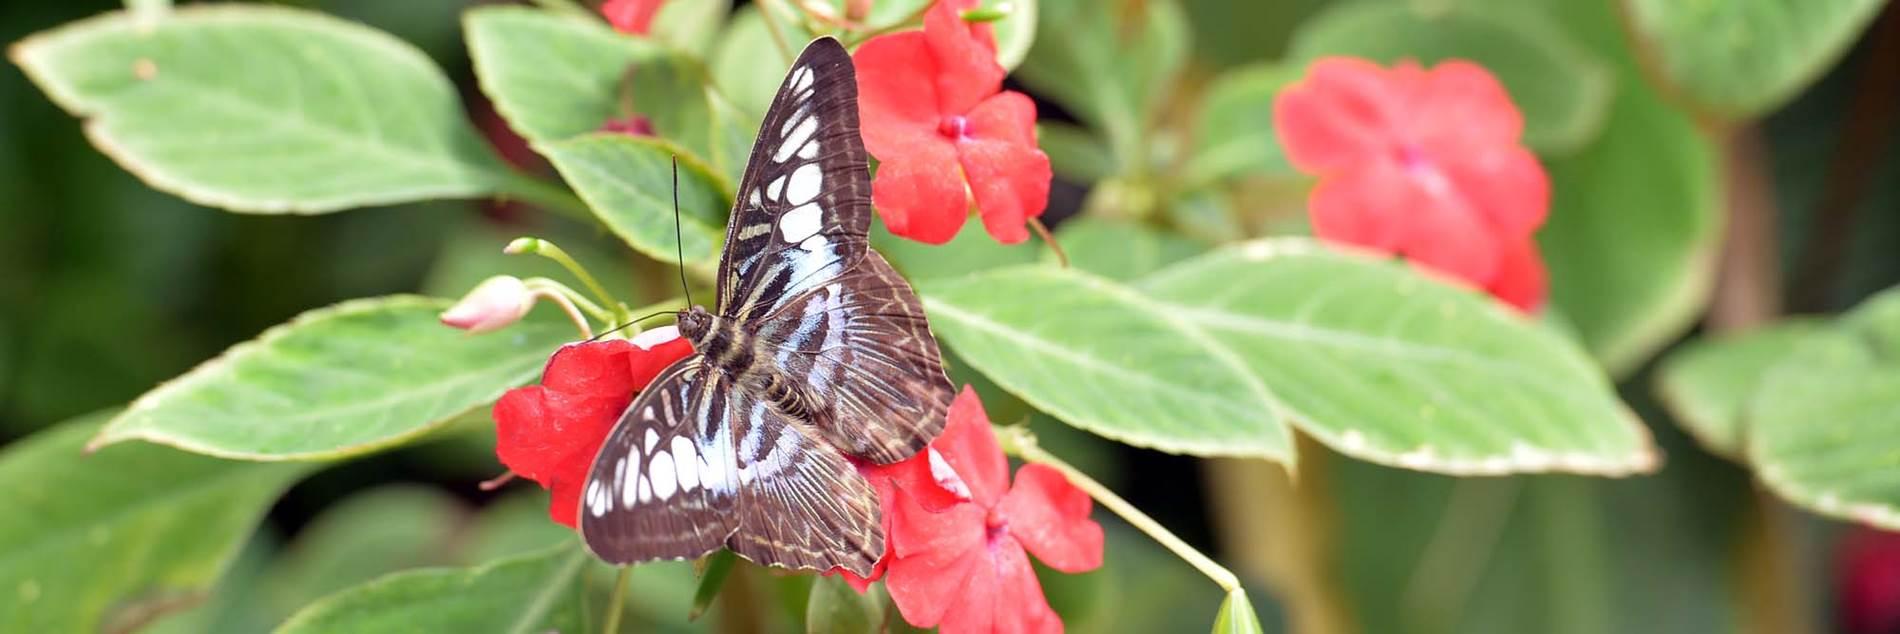 jardin-aux-papillons-morbihan-bretagne-sud-17 © Michel RENAC